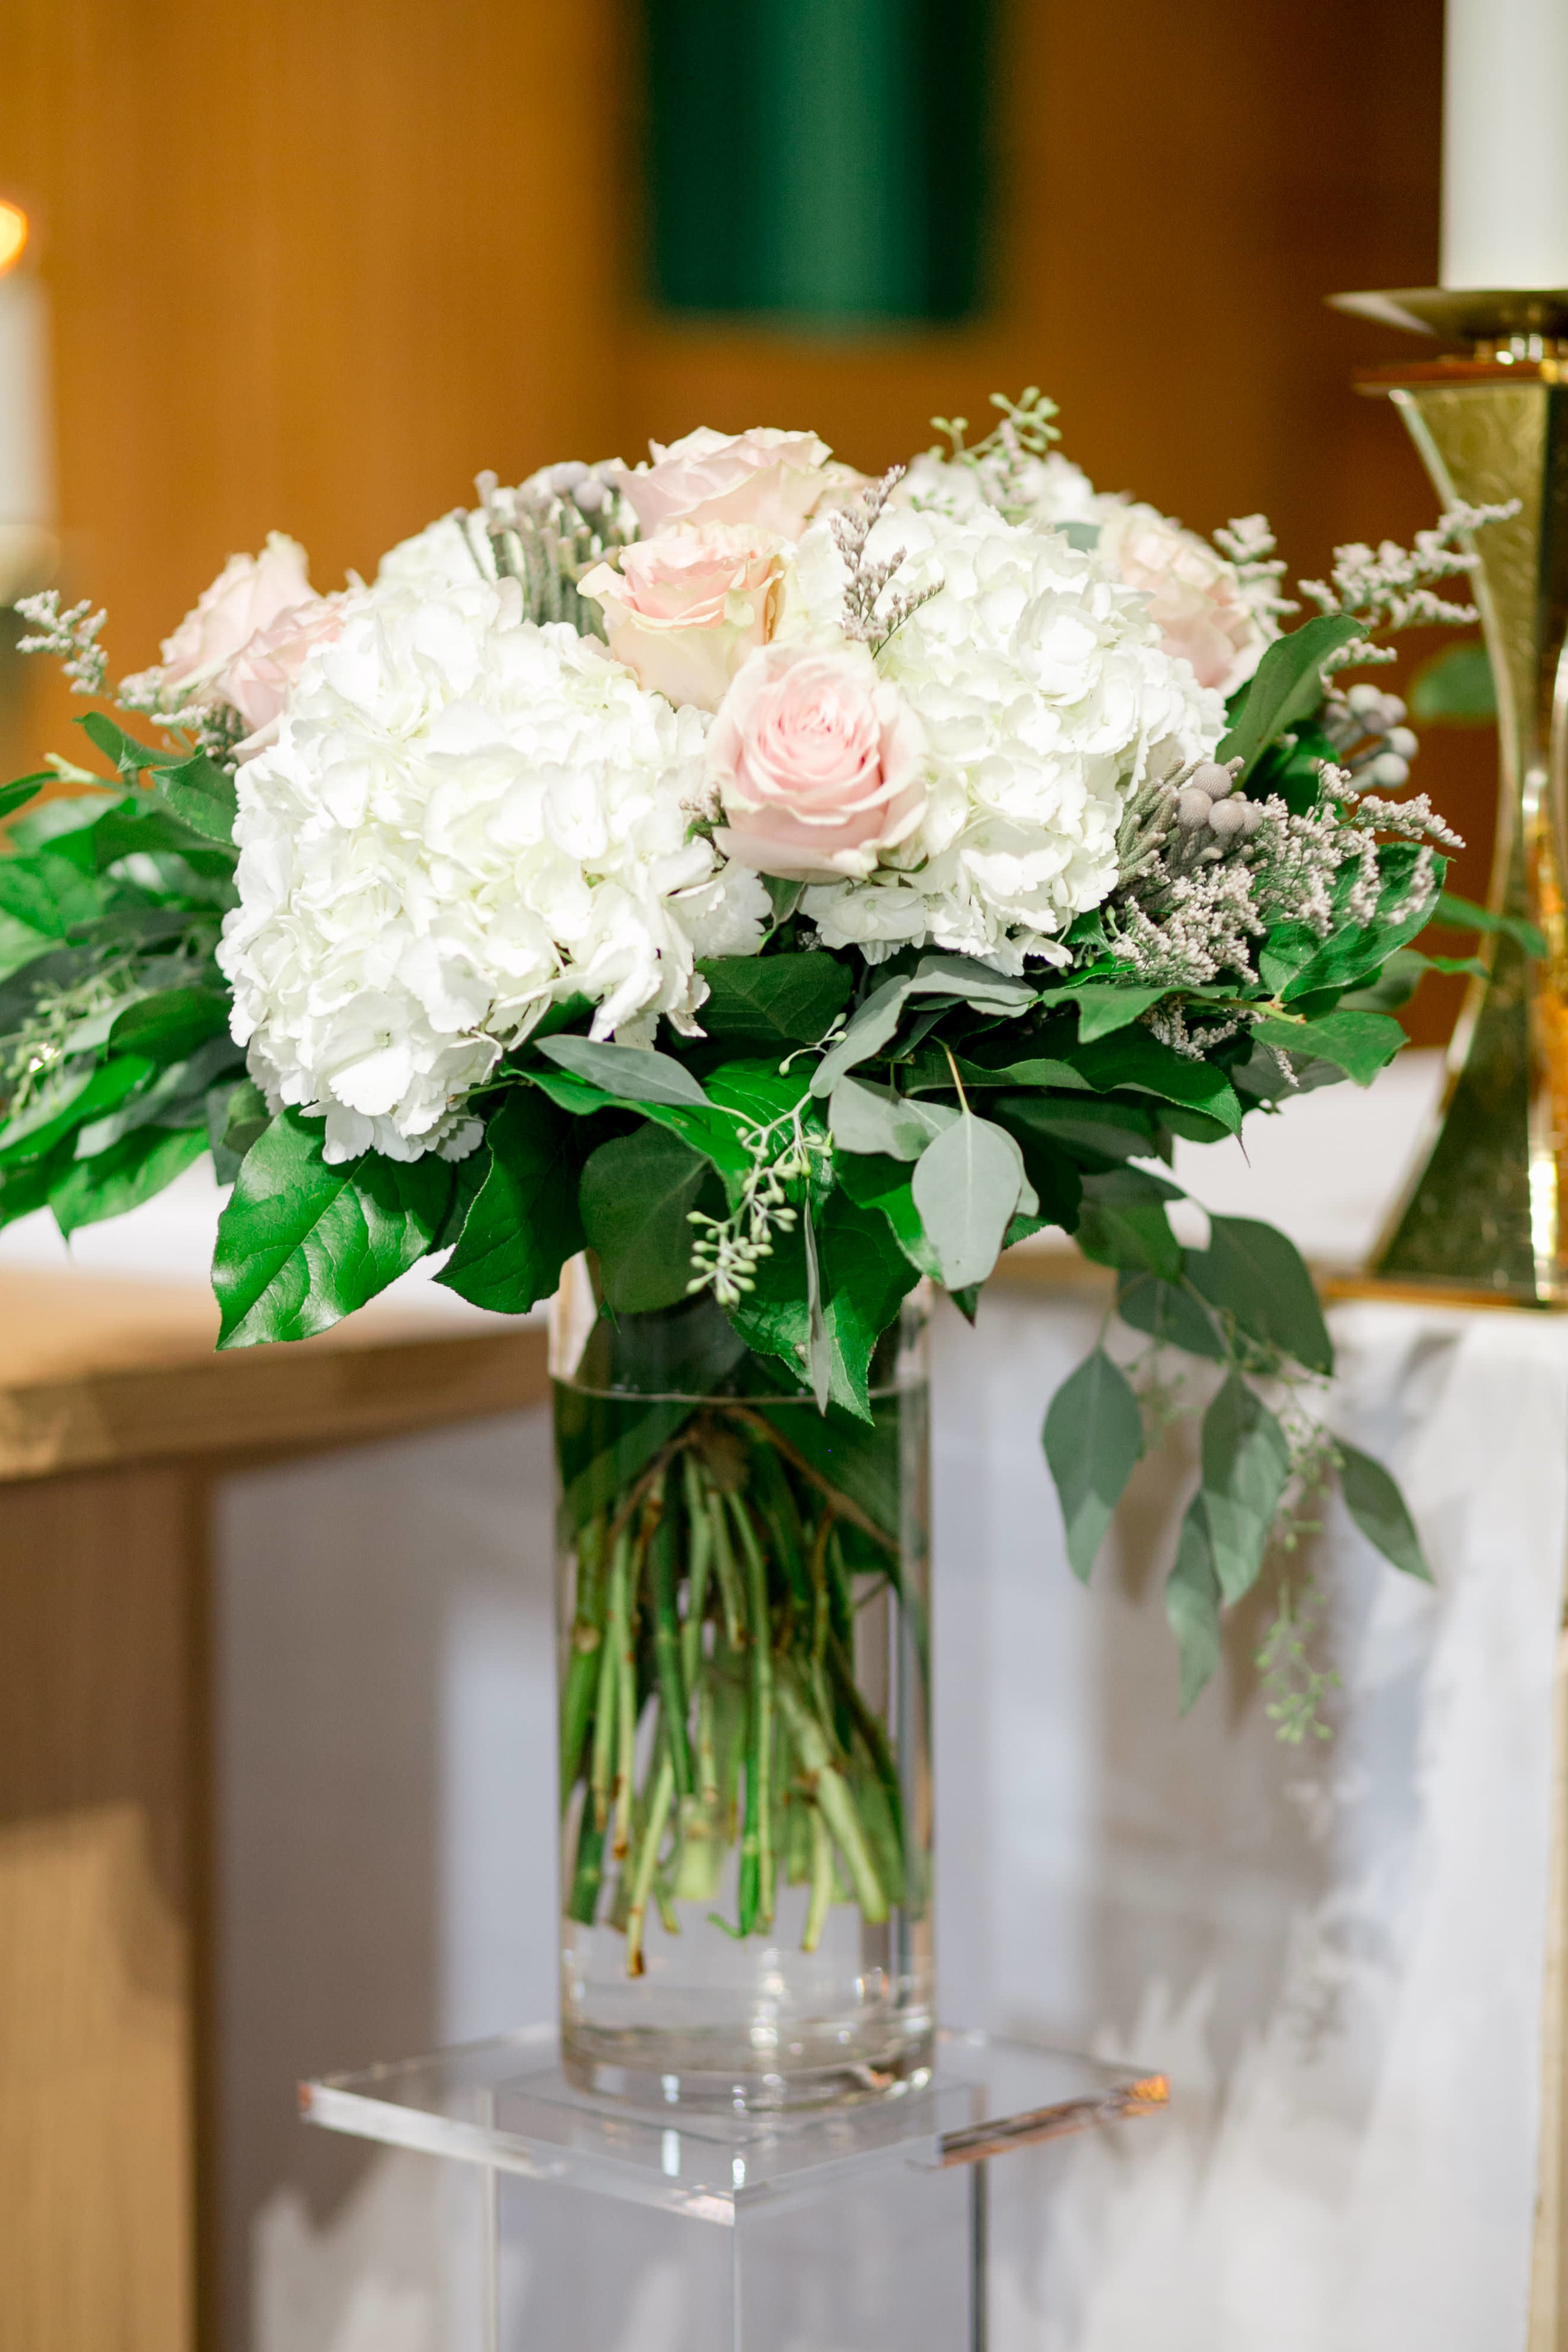 Stefanie___Bernard___Daniel_Ricci_Weddings_High_Res._Finals__190.jpg